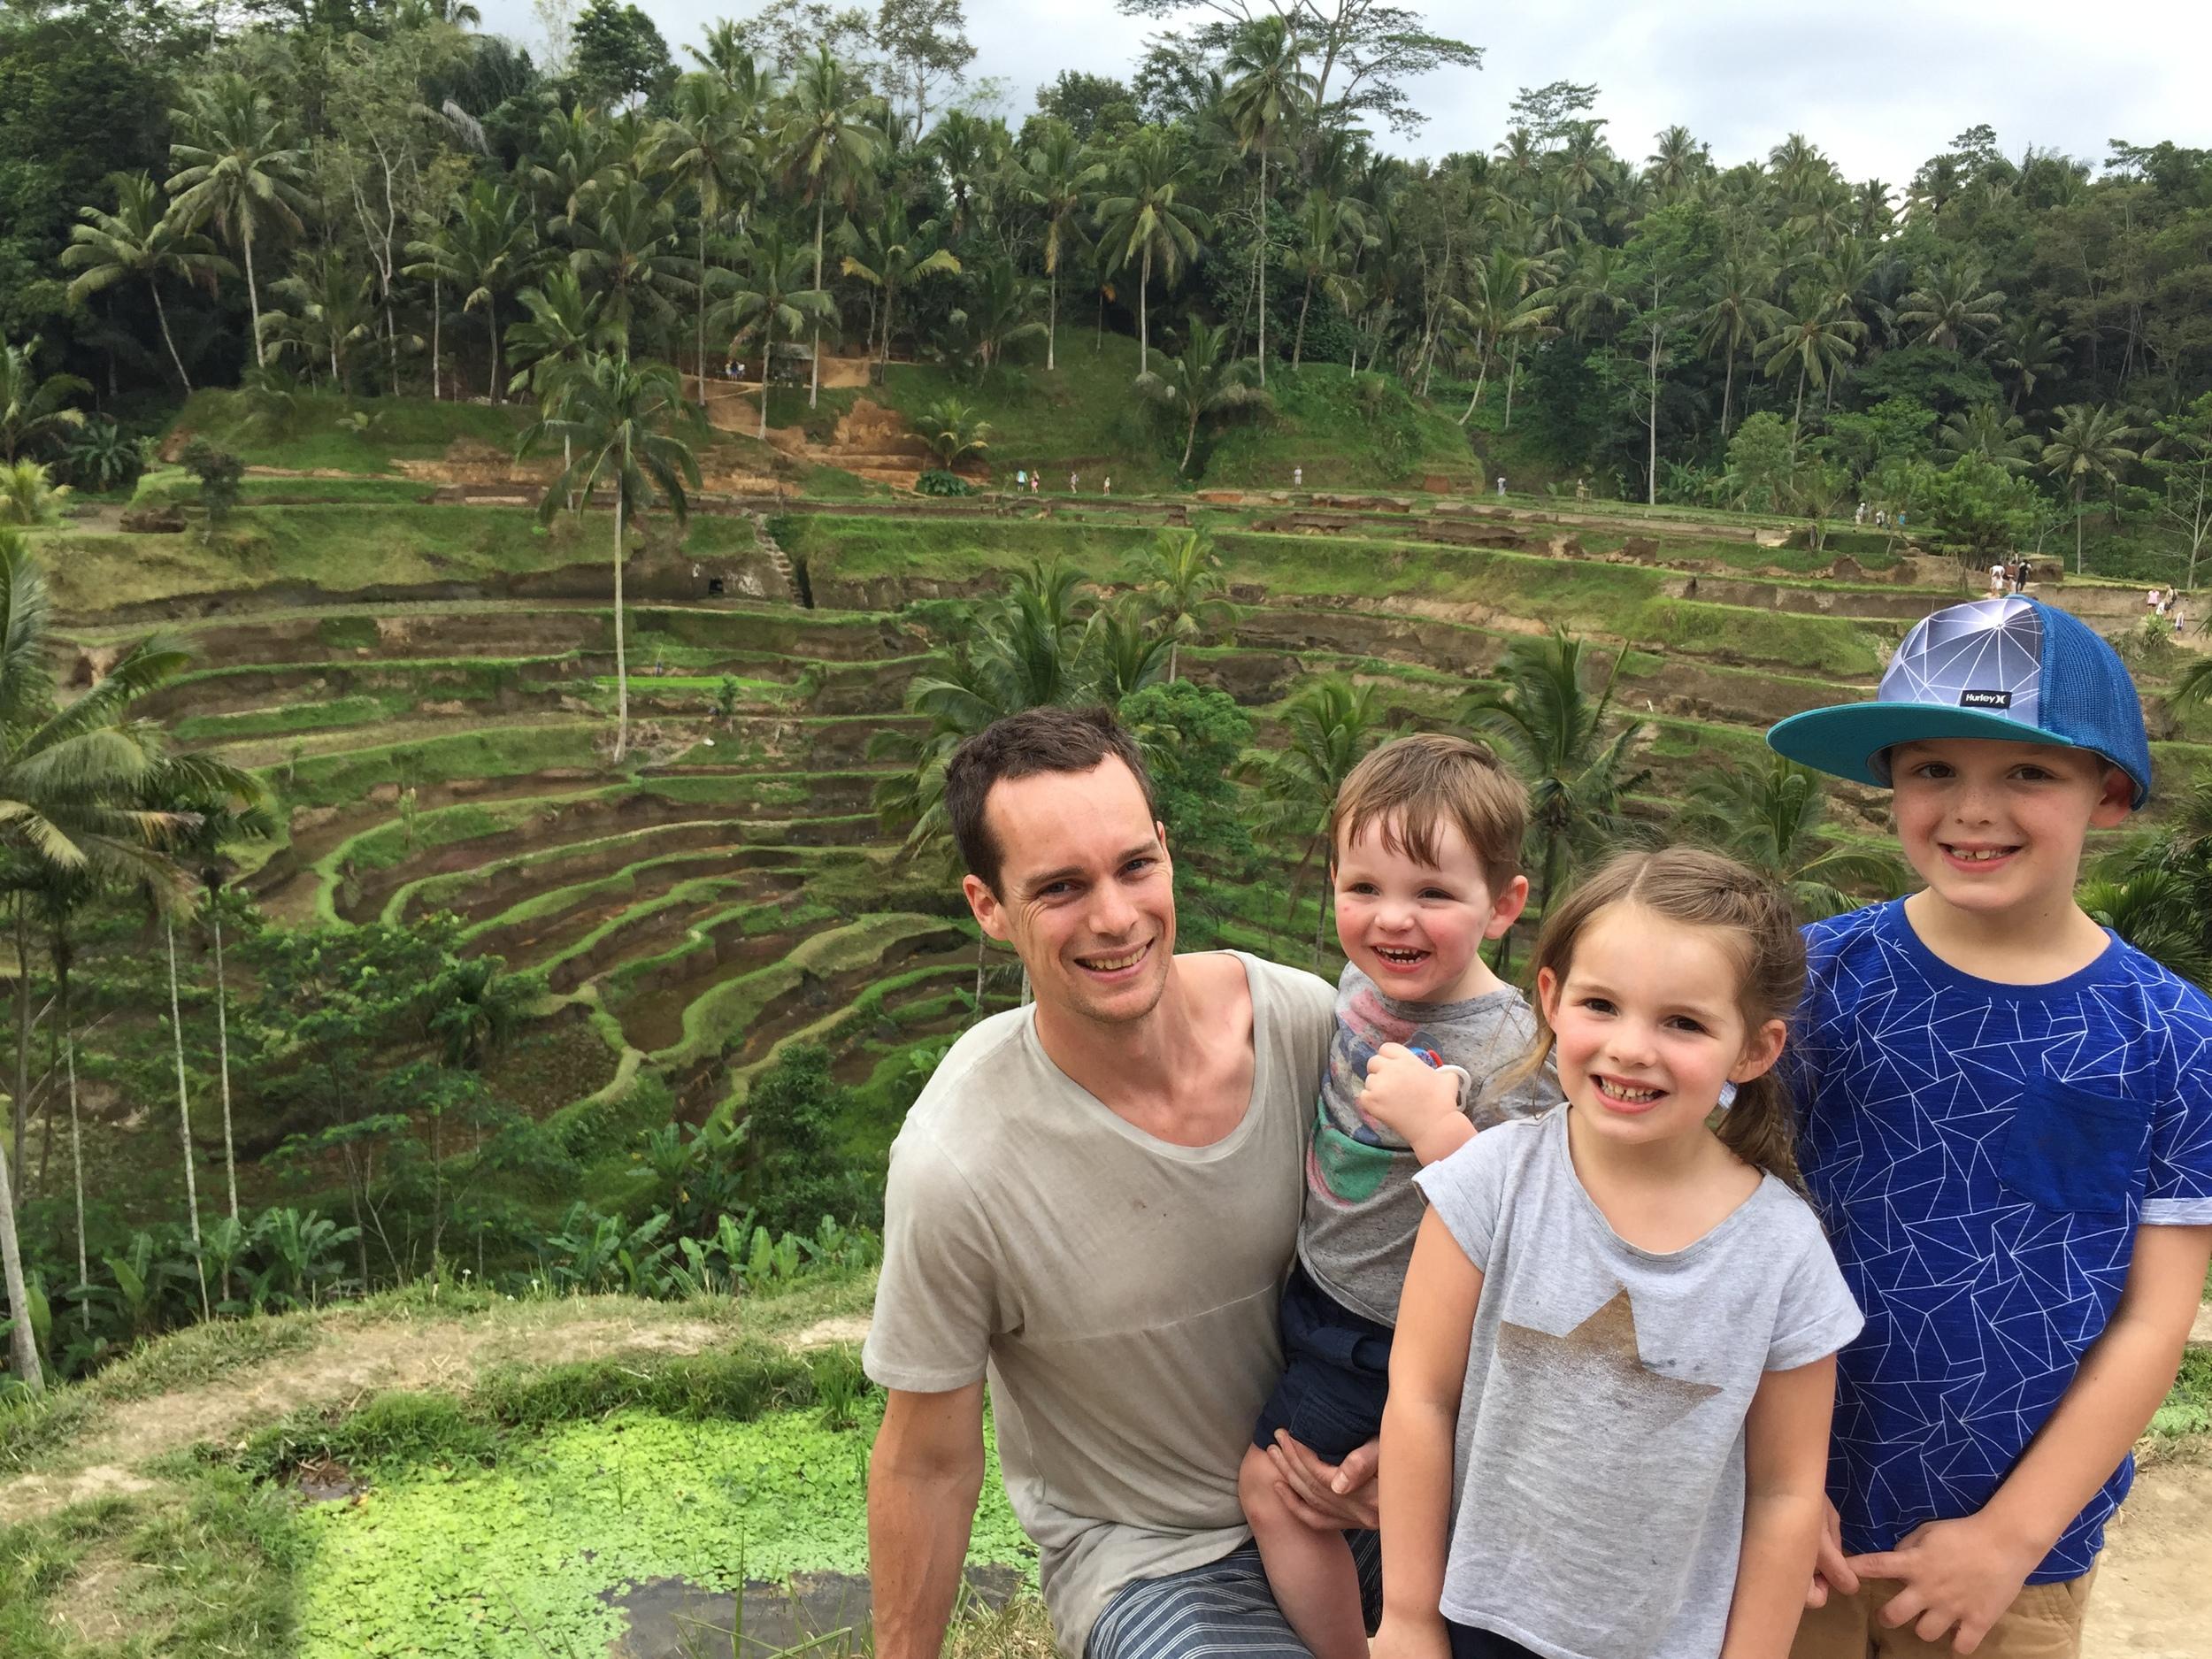 The Stunning Rice Fields of Bali